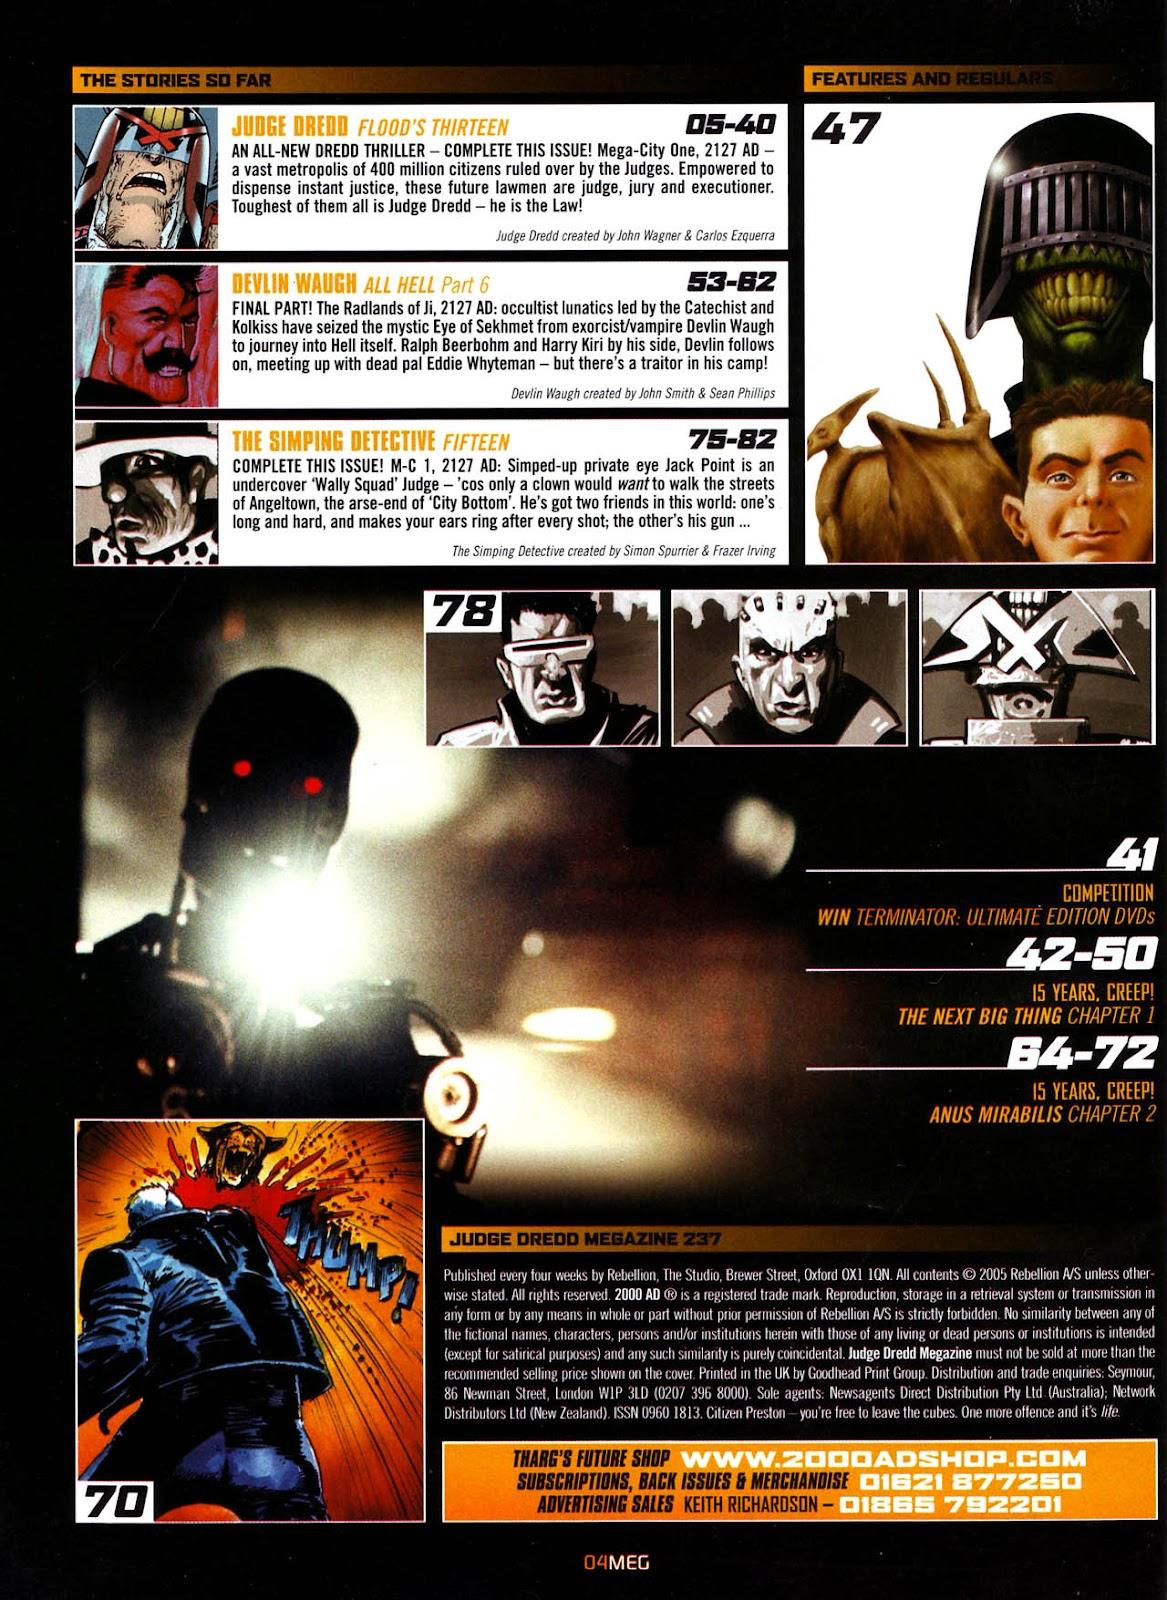 ... Judge Dredd Megazine (Vol. 5) Issue #237 #37 - English 6 ...